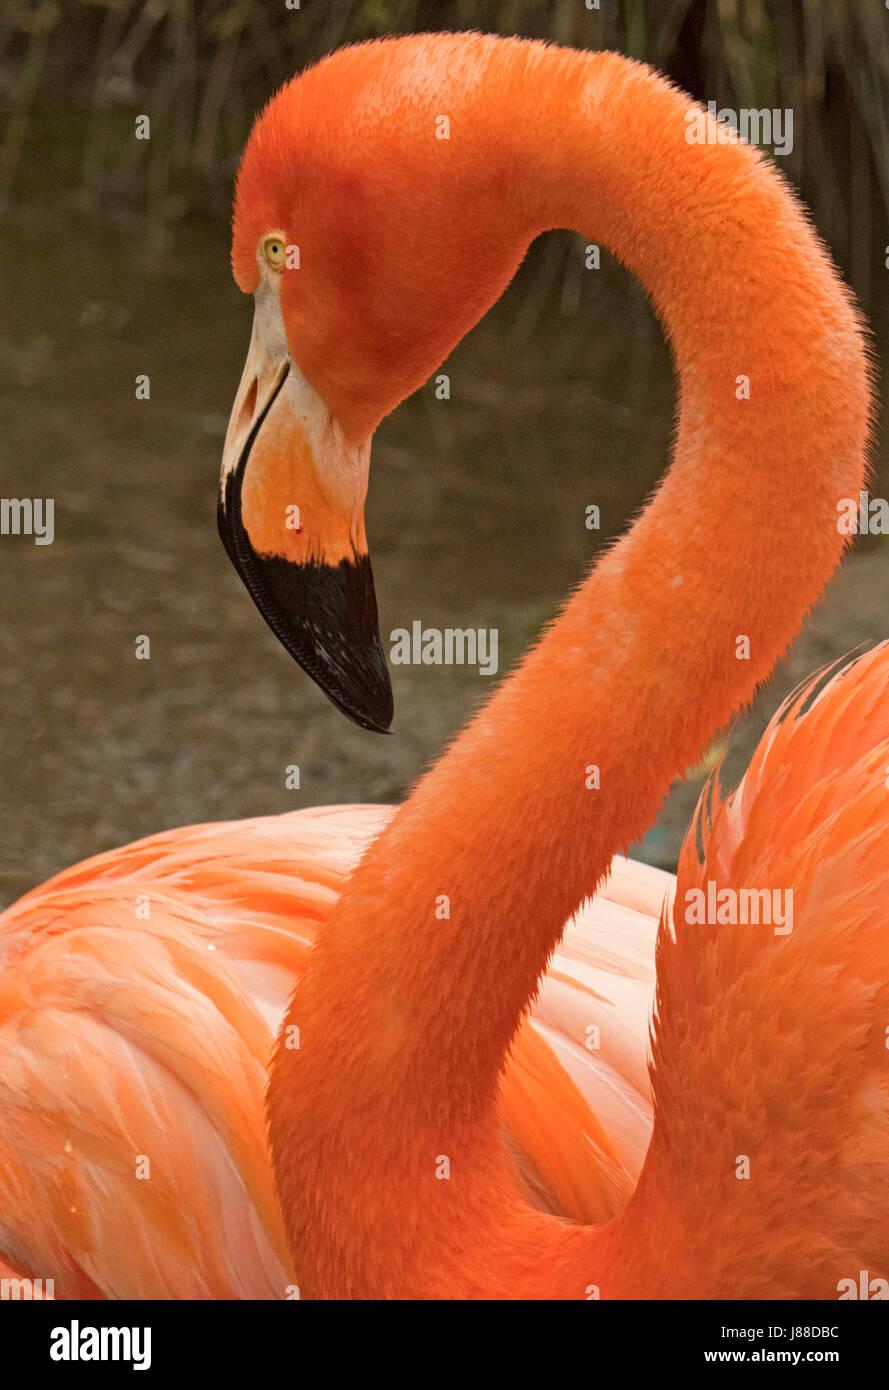 American Flamingo at Sacramento Zoo, California, USA. - Stock Image